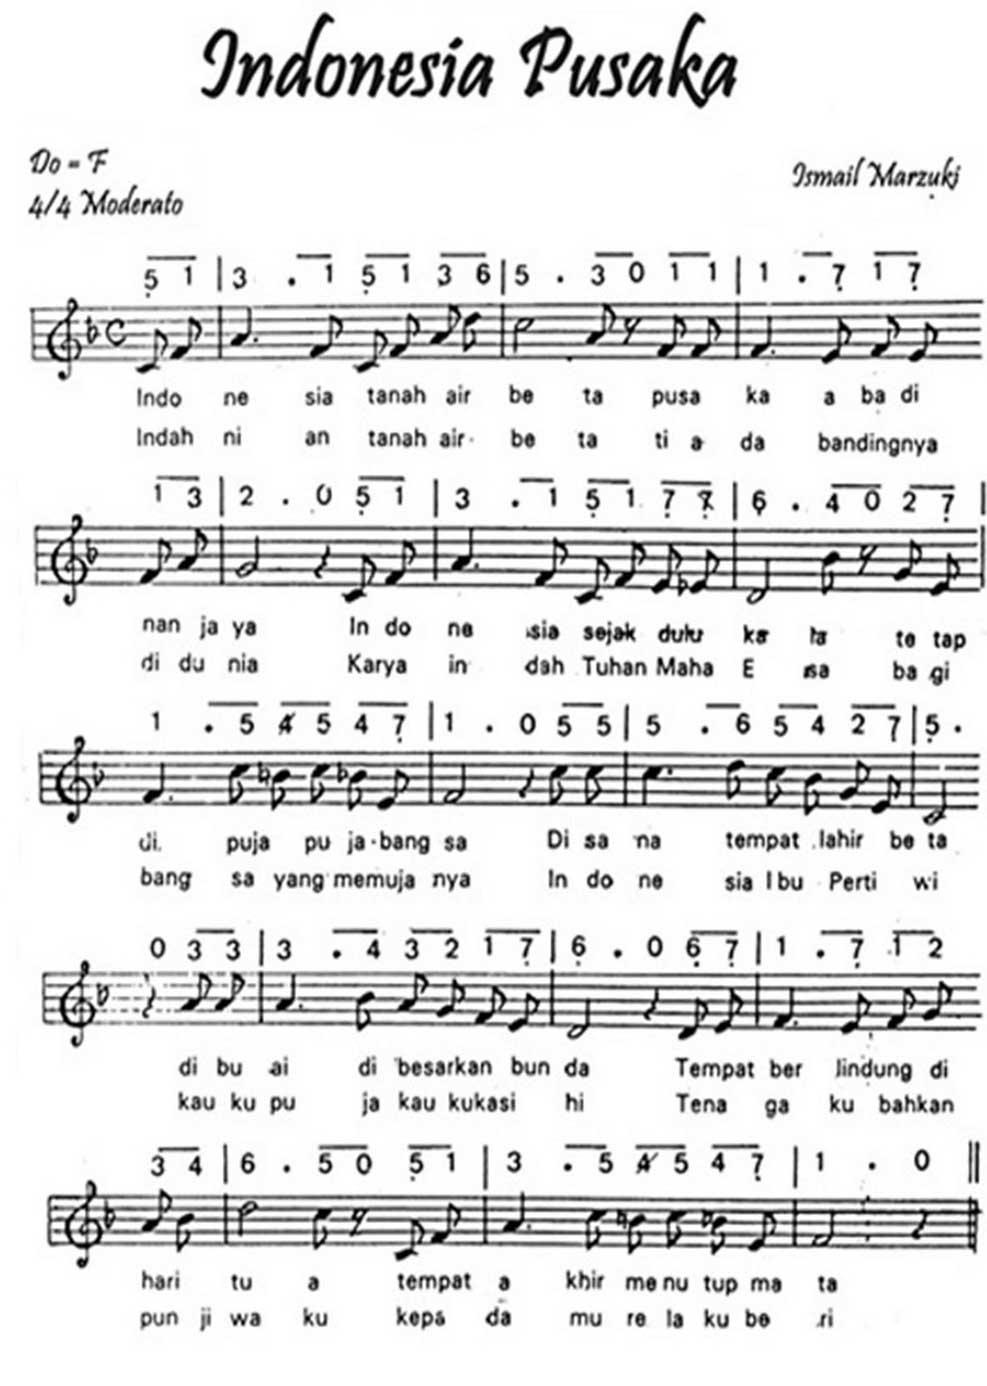 Syair Lagu Indonesia Pusaka : syair, indonesia, pusaka, Lirik, Indonesia, Pusaka, Wajib, Nasional, Lirikaz